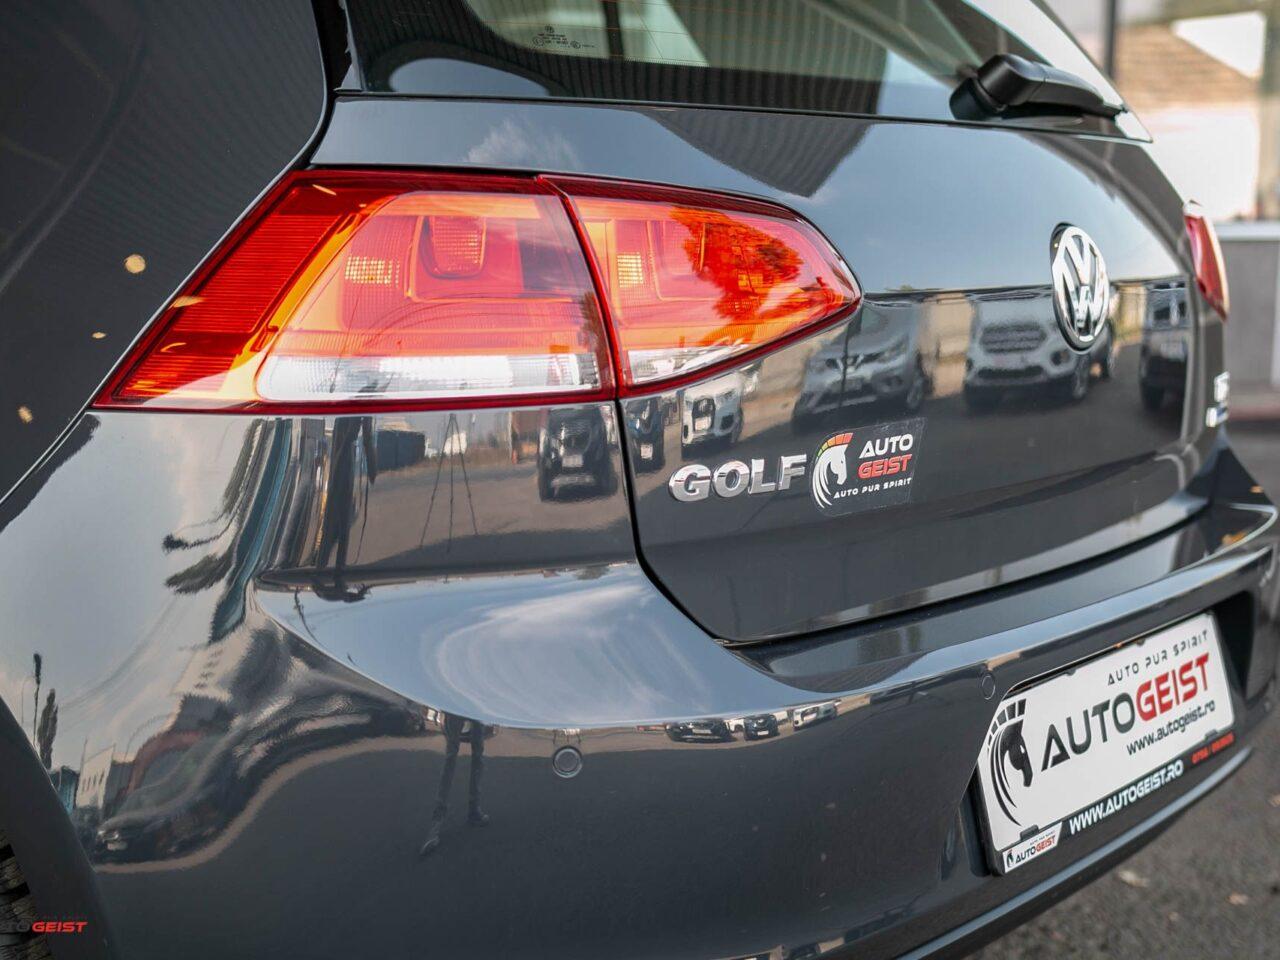 VW-golf-7-scurt-2016-3321